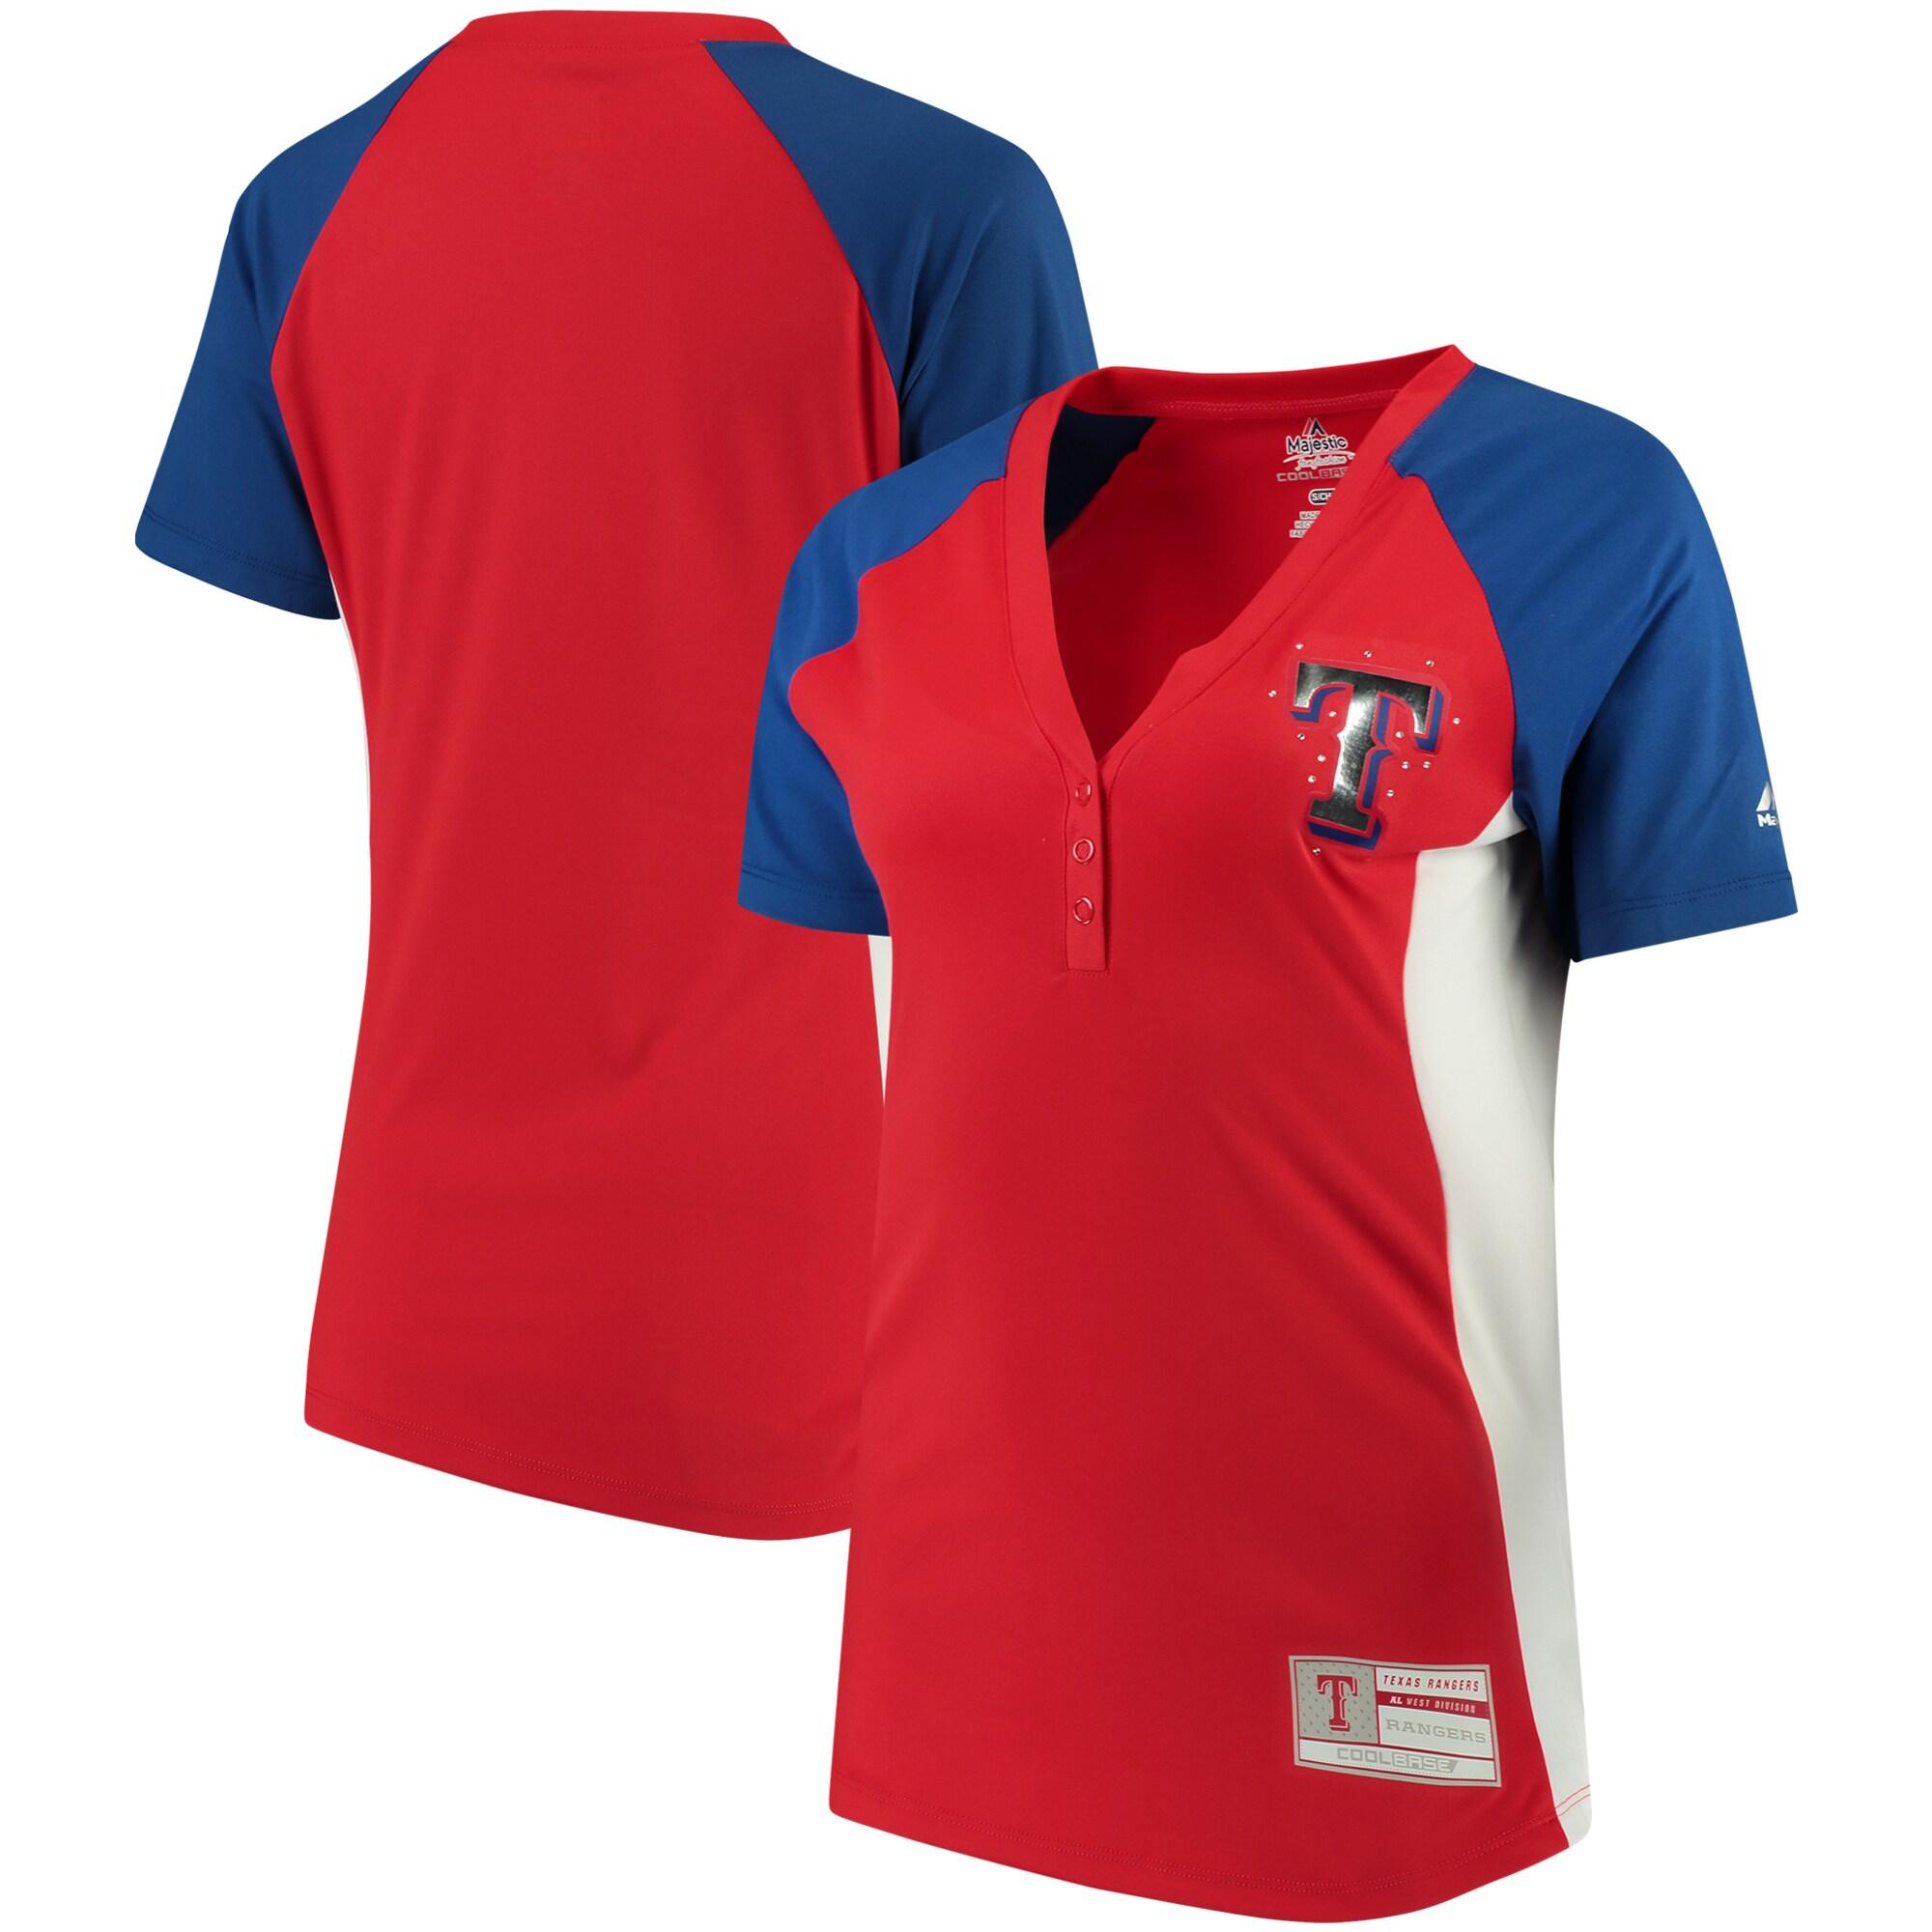 Texas Rangers Majestic Women's League Diva Snap Placket T-Shirt - Red